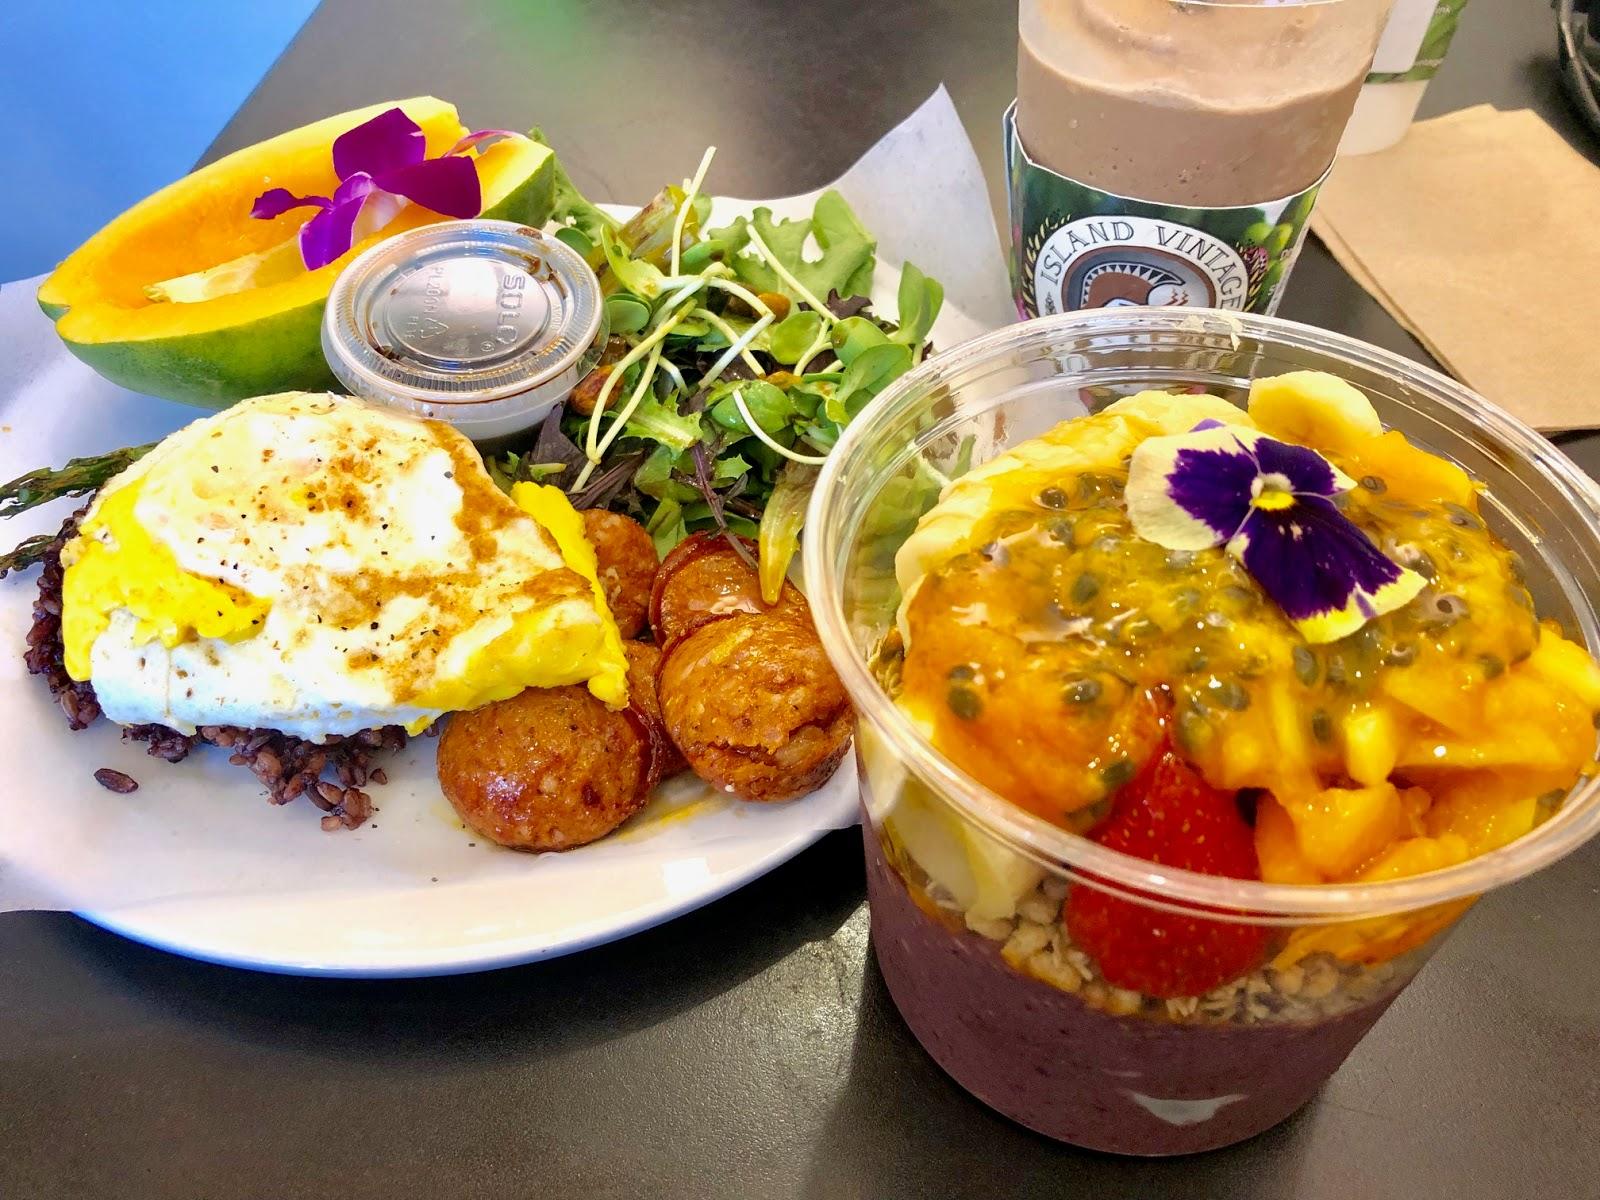 Island Vintage Coffee Maui Review Breakfast